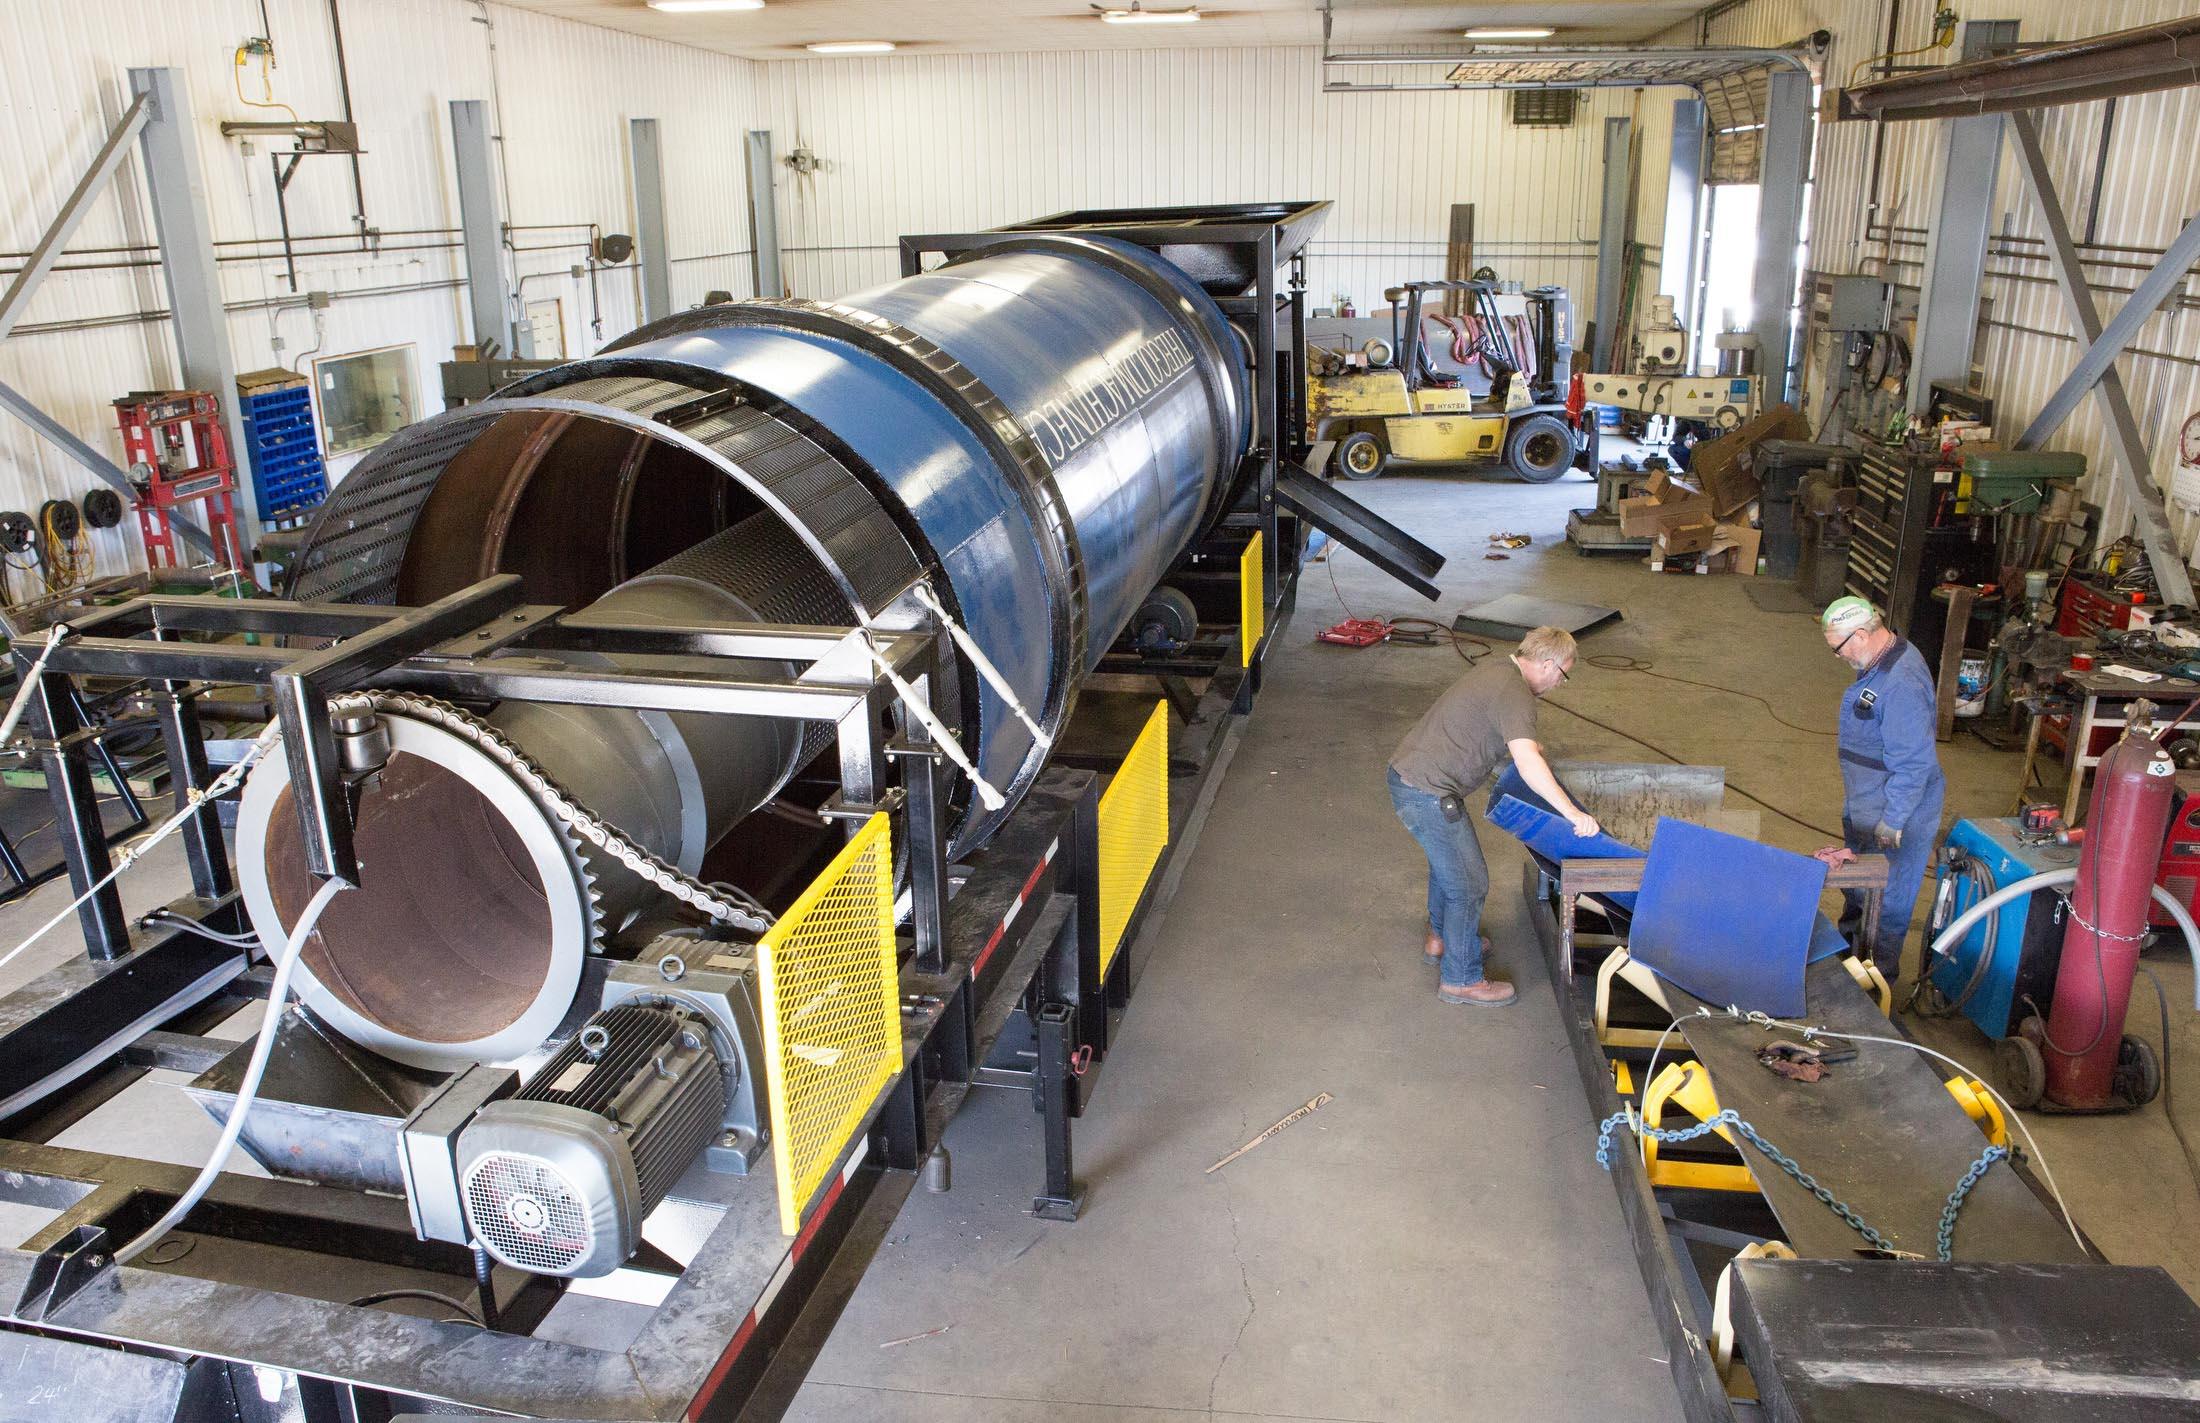 The Gold Machine Fabrication Shop